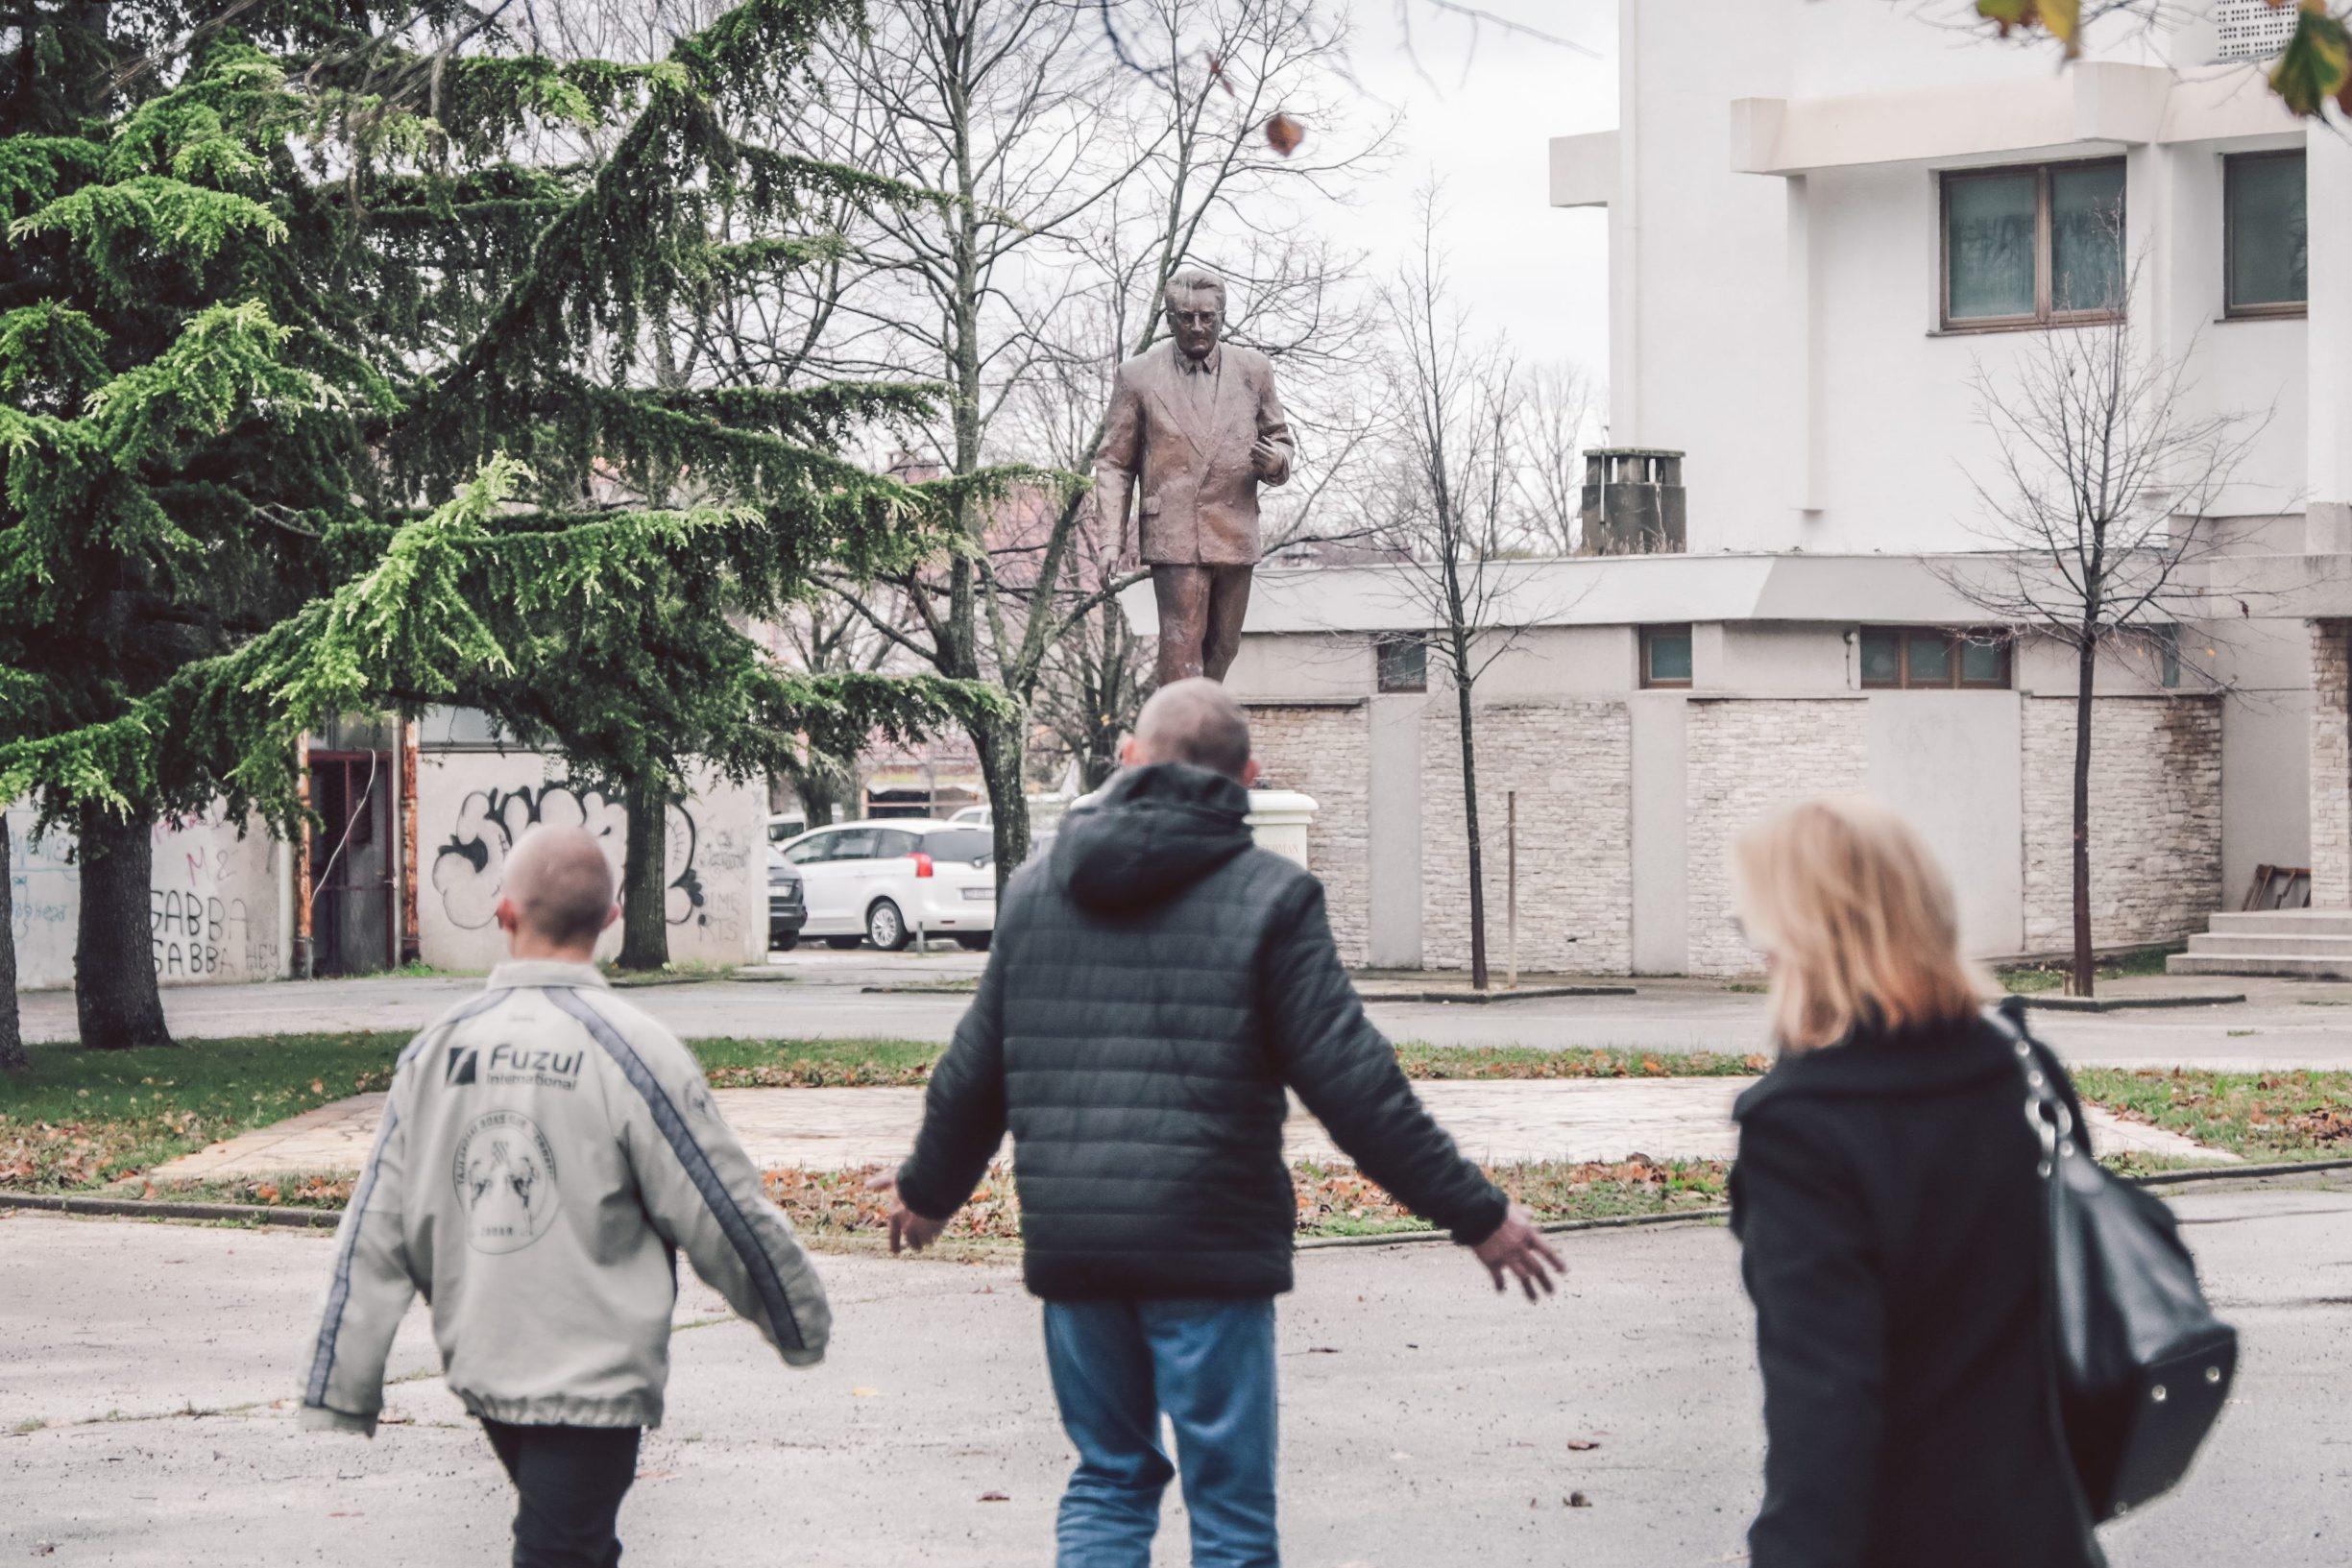 Benkovac, 031219 Reportaza o Benkovcu. Na fotografiji spomen obiljezje Franji Tudjmanu u Benkovcu. Foto: Danijel Soldo / CROPIX